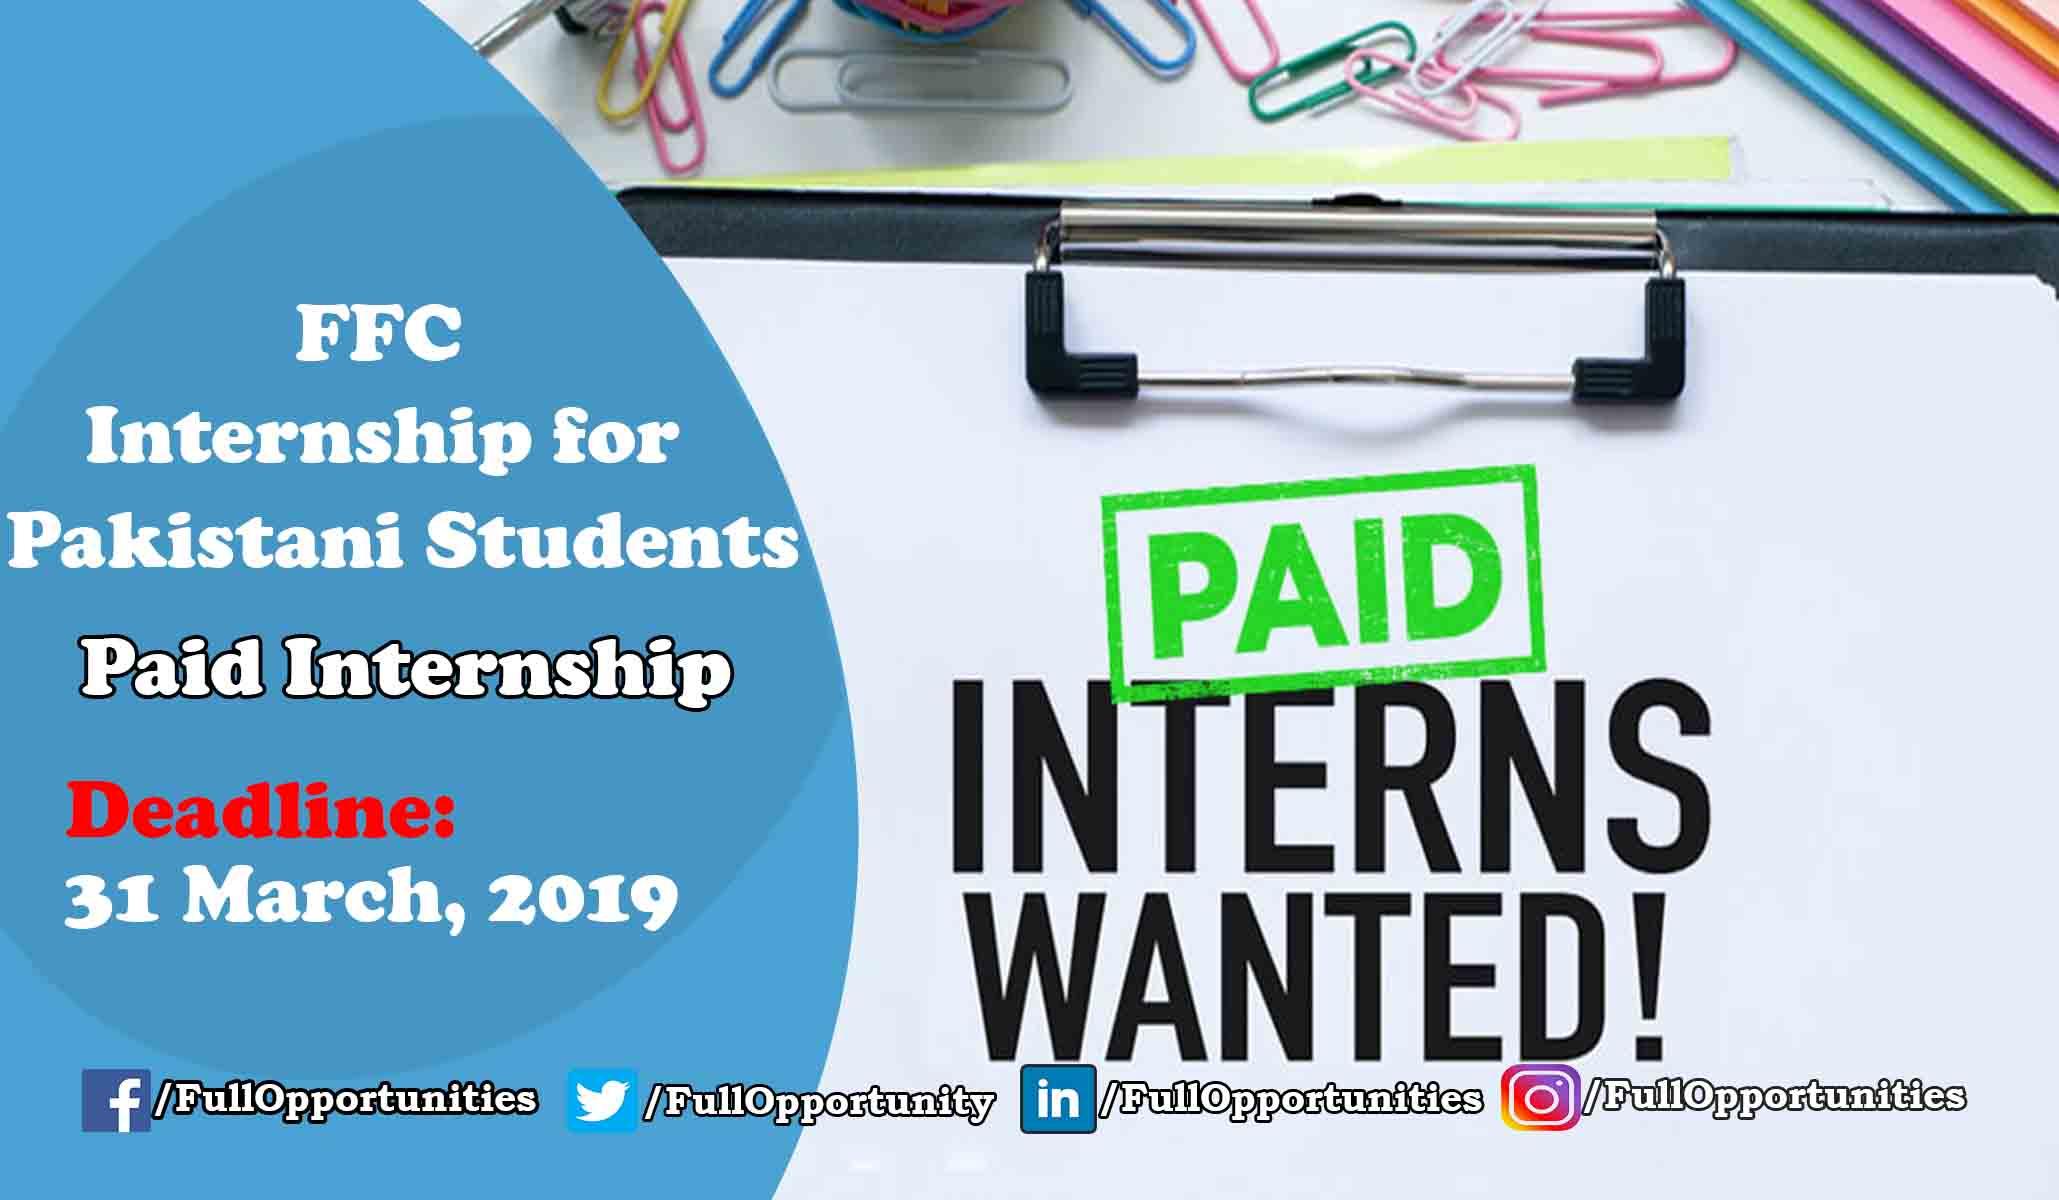 FFC Internship For Pakistani Students - Paid Internship 2019